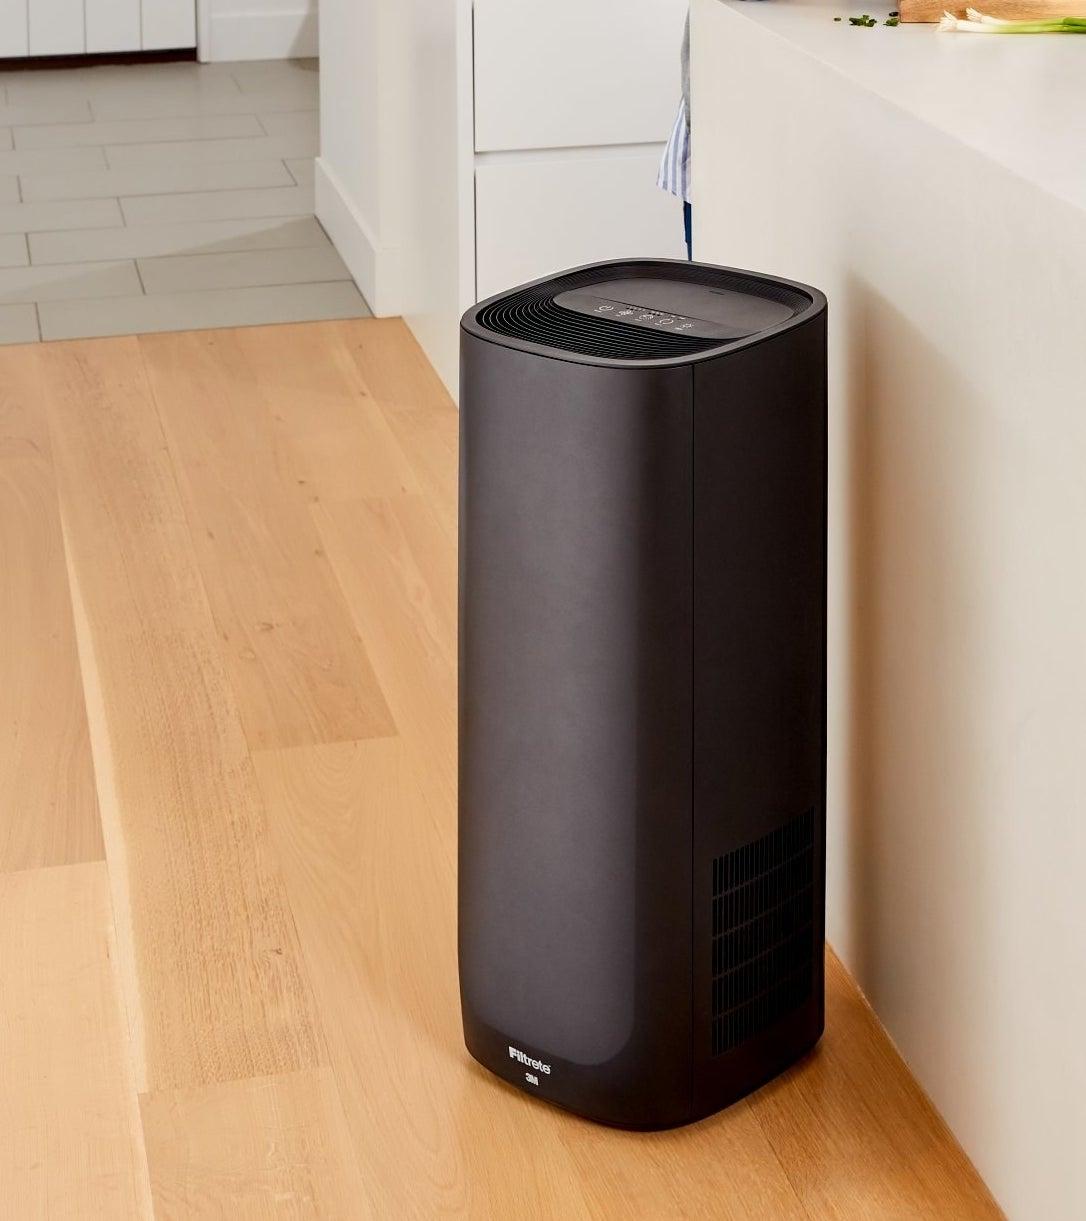 The HEPA-type air purifier